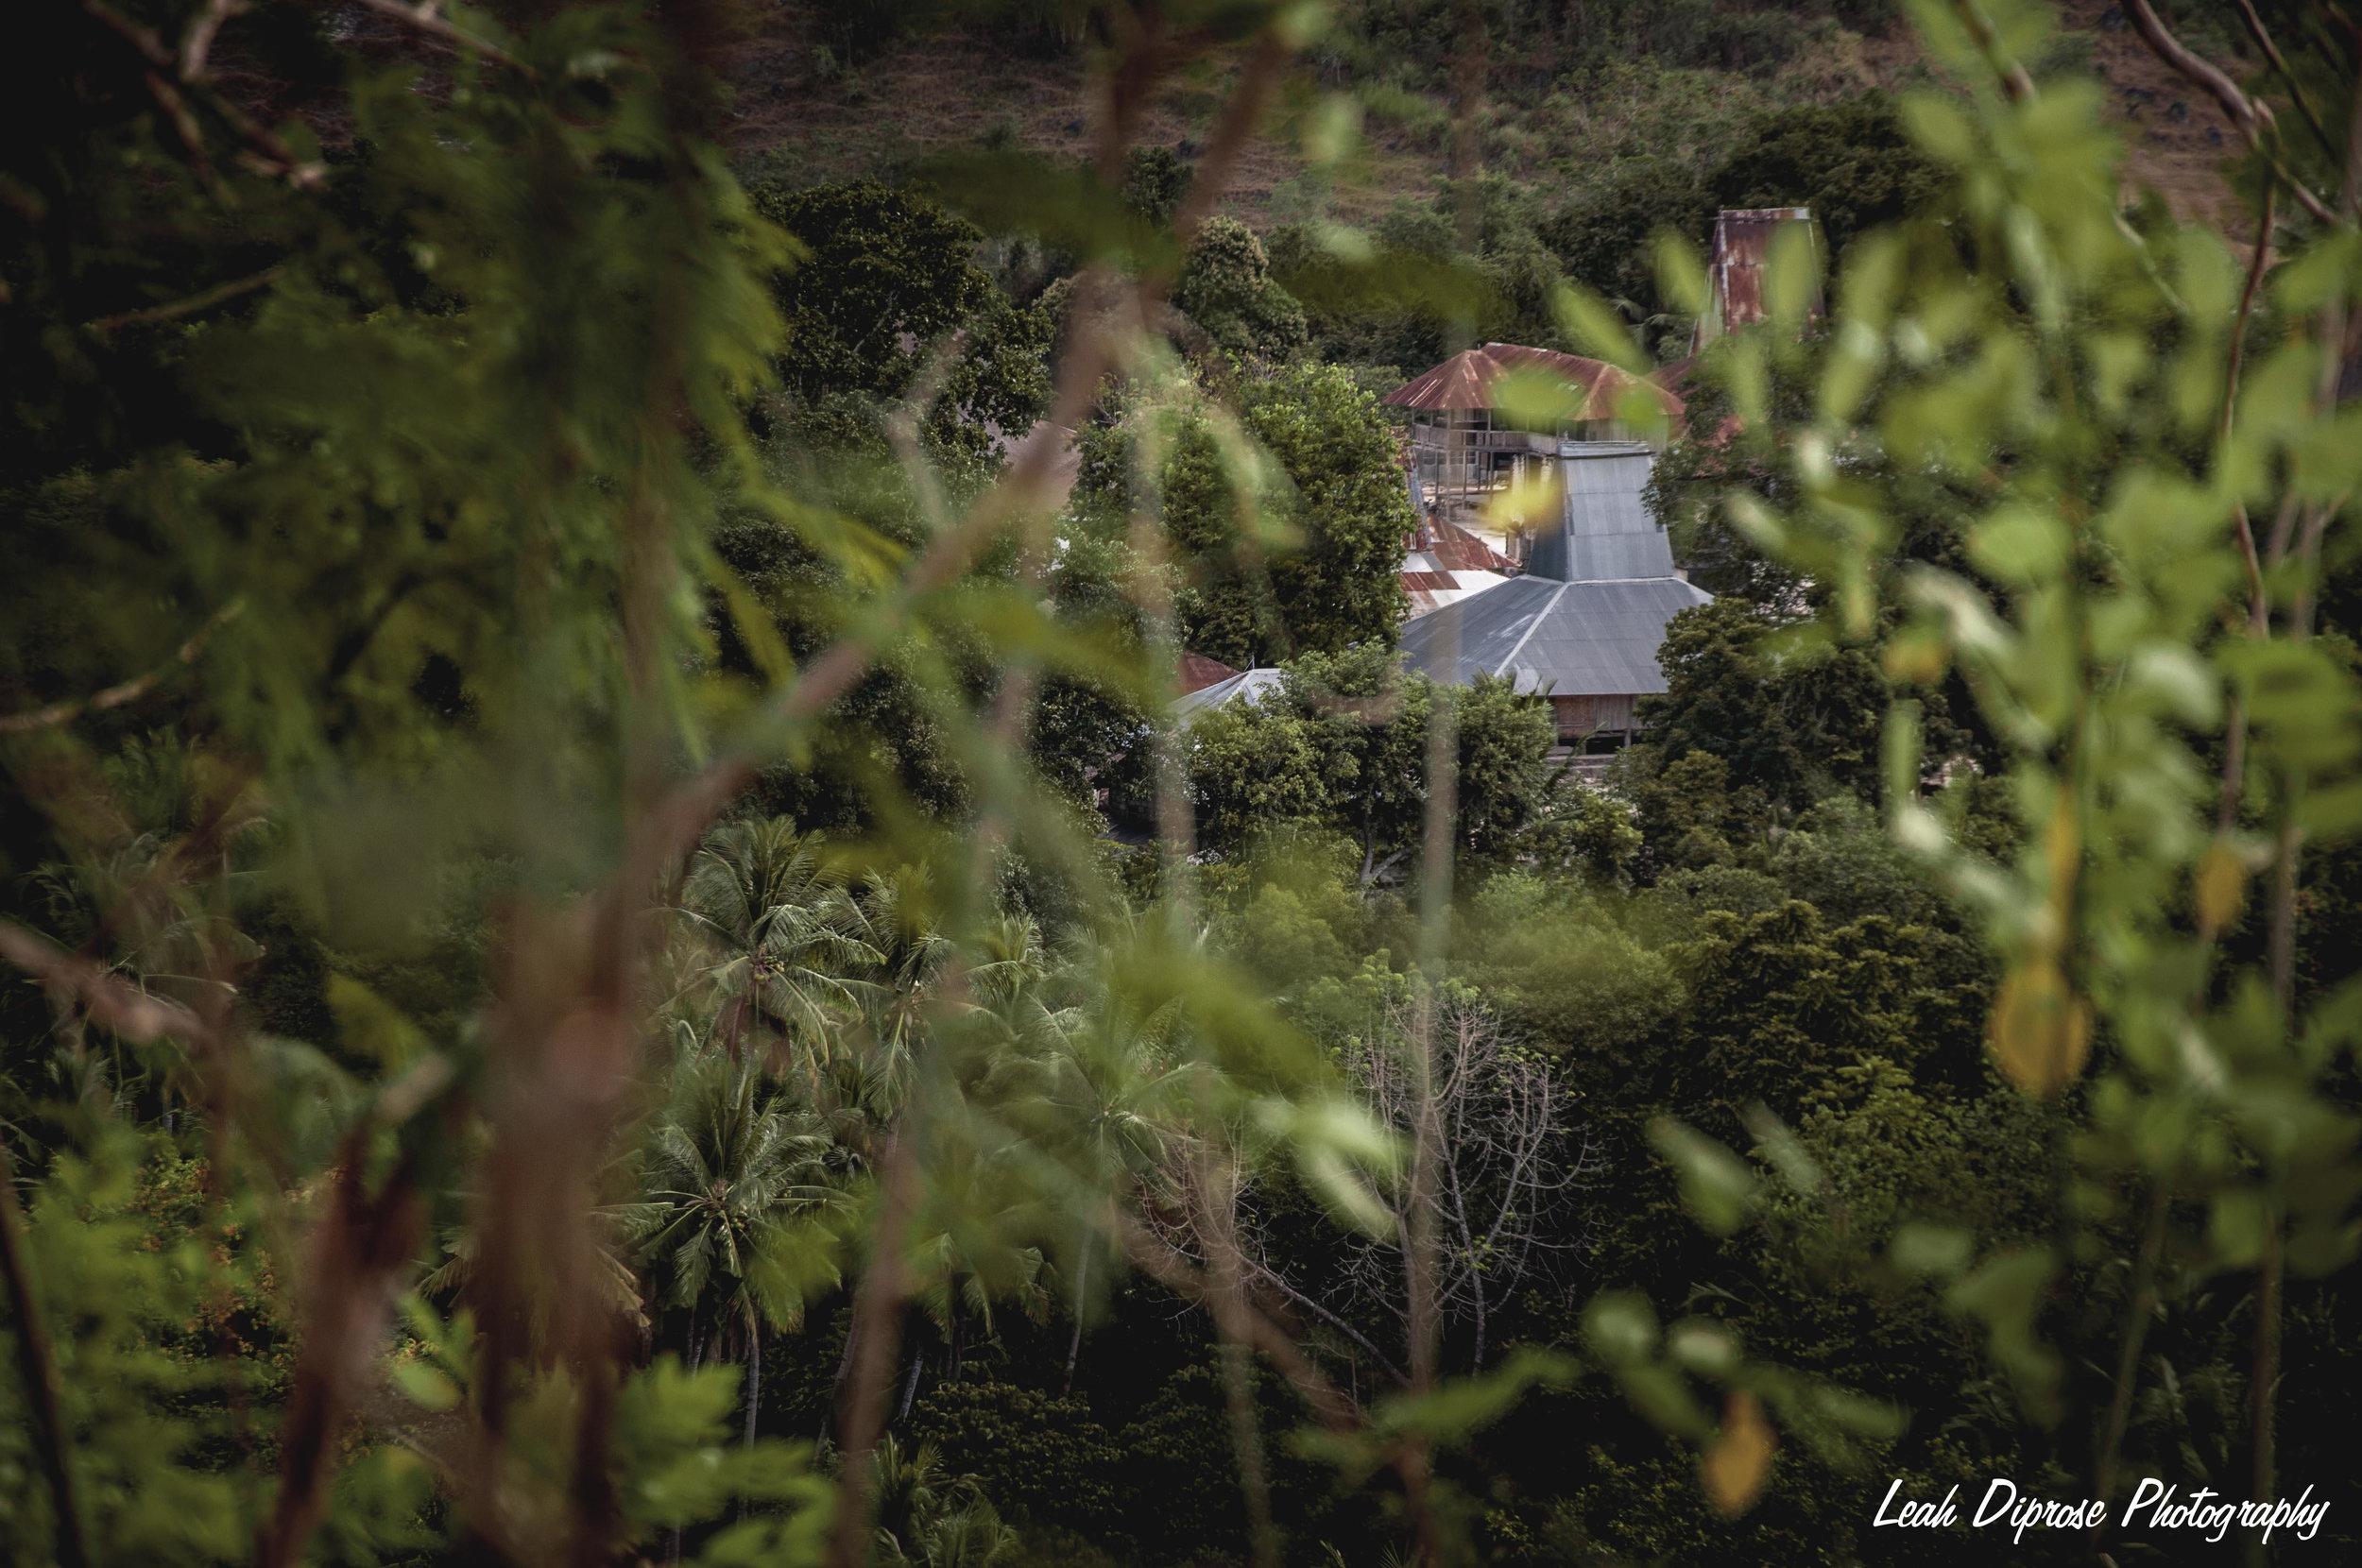 Leah Diprose Photography image-5233.jpg